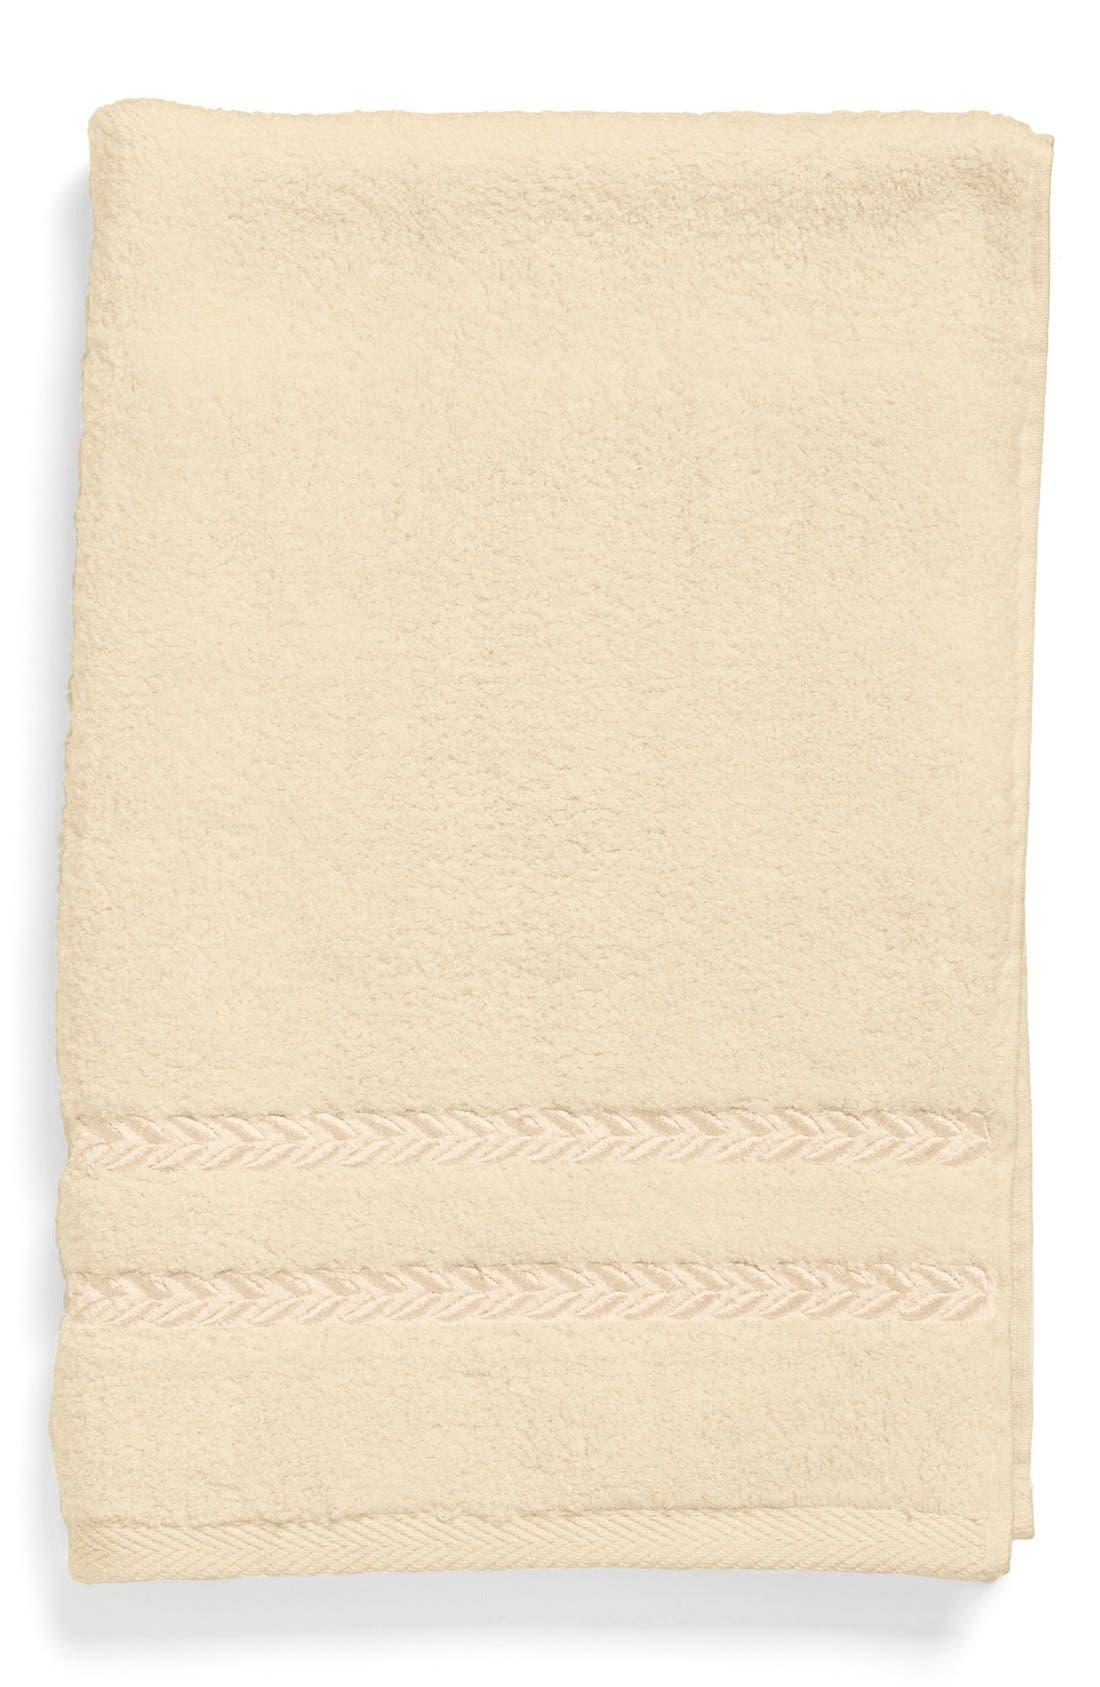 'Pearl Essence' Hand Towel,                             Main thumbnail 1, color,                             250